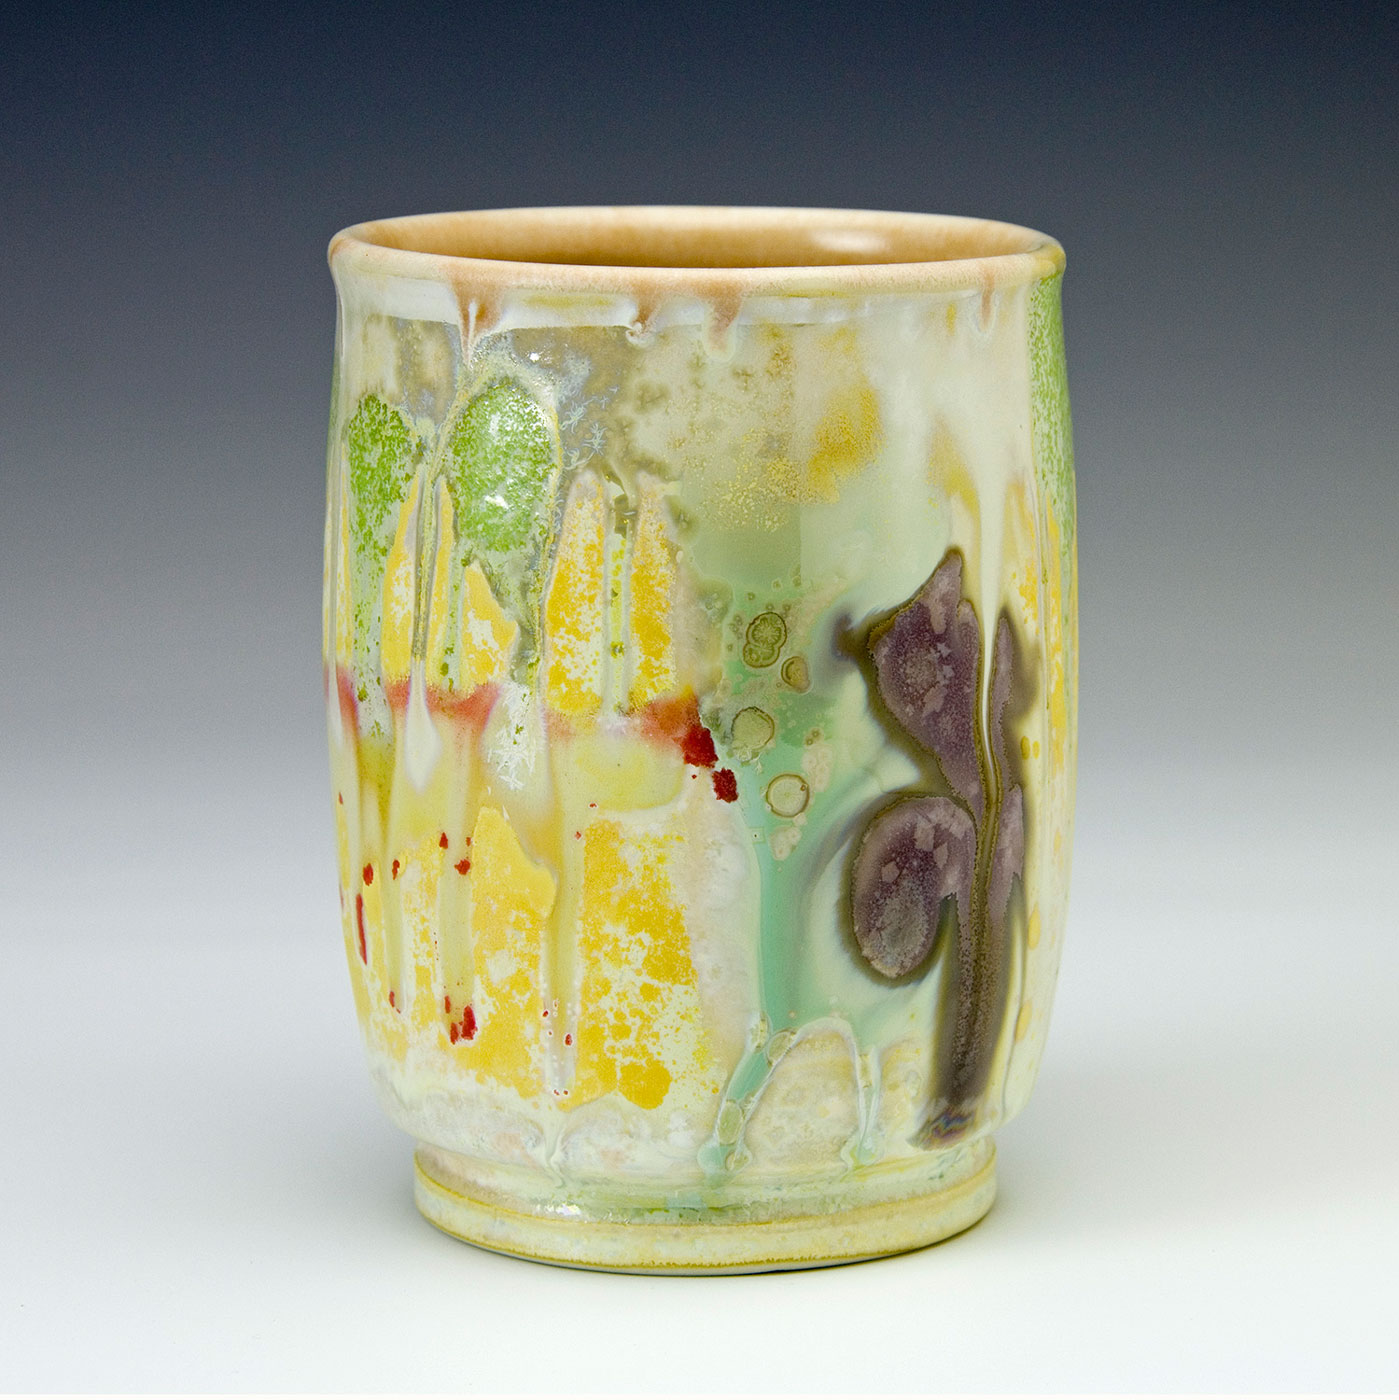 Art-Flow-handmade-drinking-cup-Samantha-Henneke.jpg